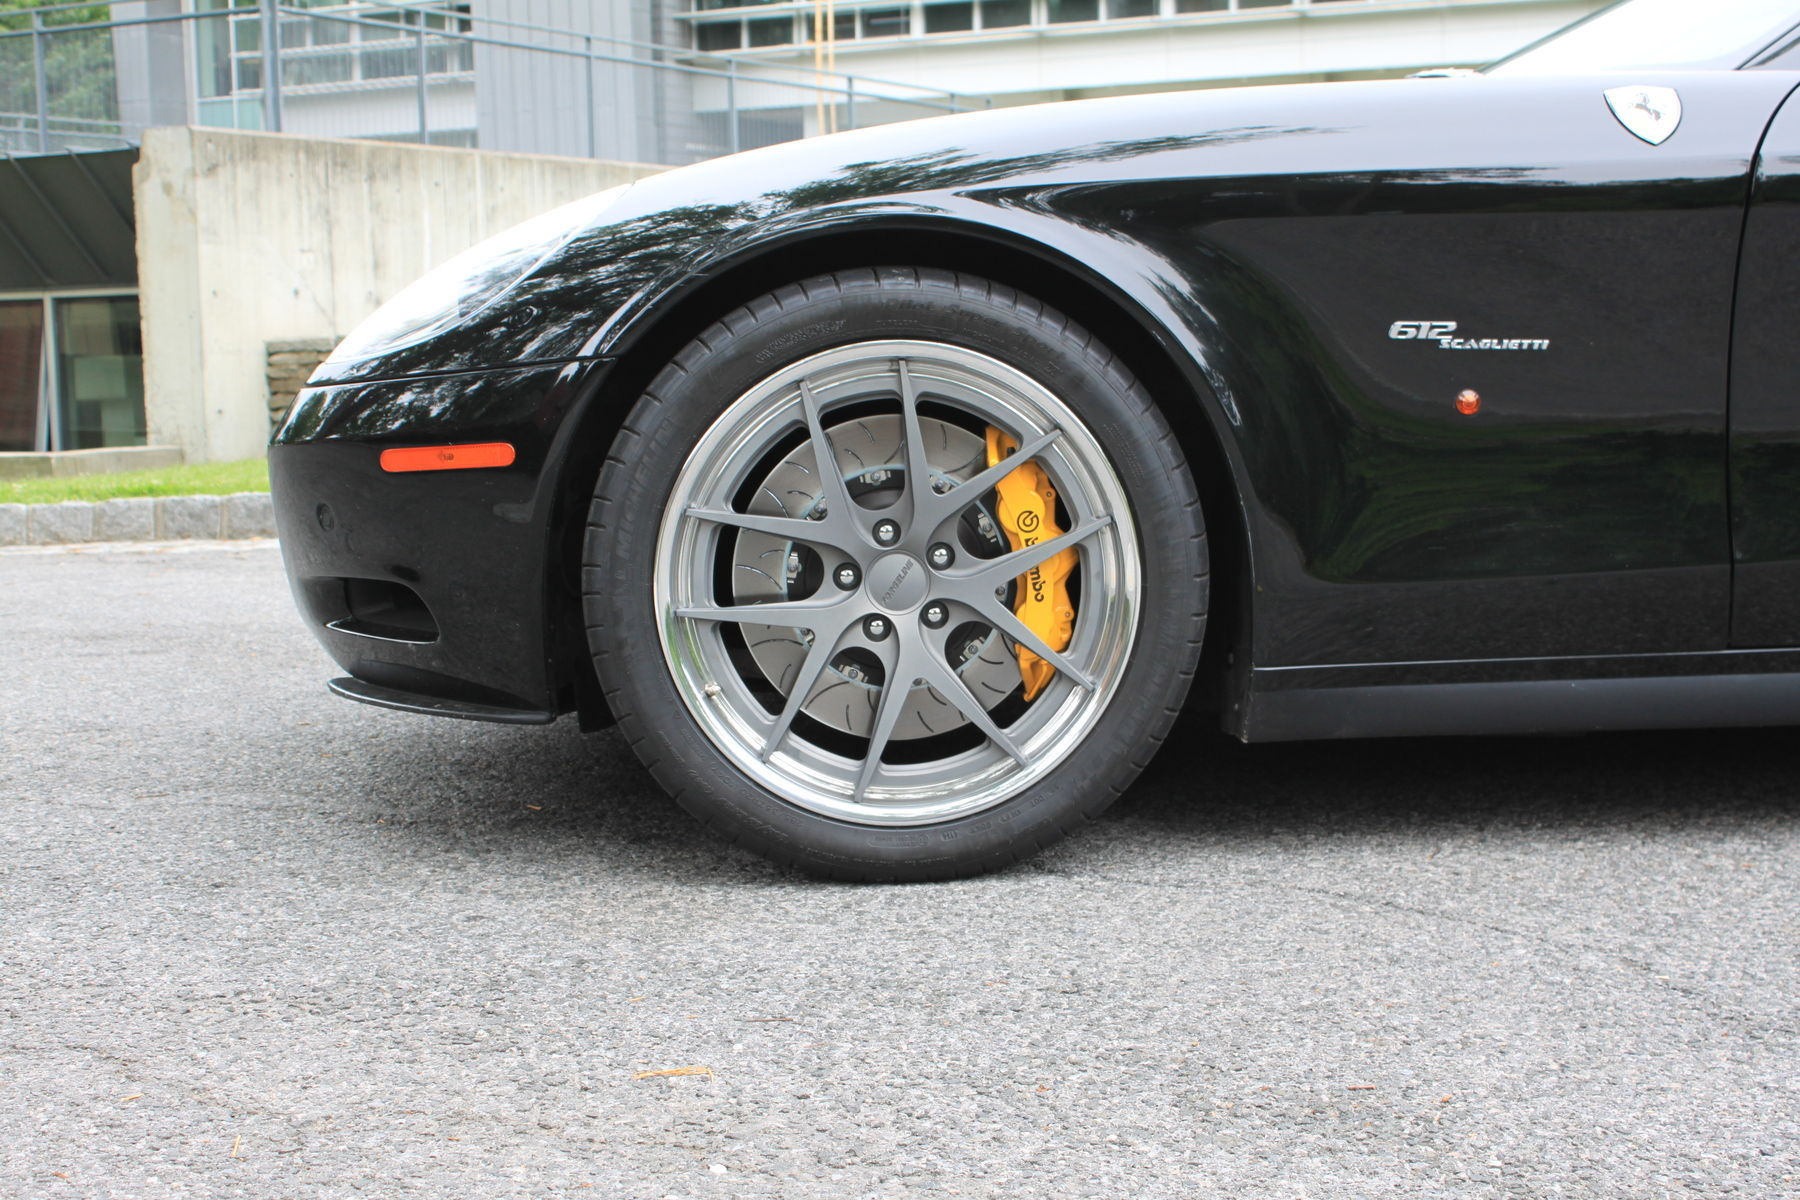 2006 Ferrari 612 Scaglietti |  Ferrari 612 Scaglietti on VX3C-SL Wheels